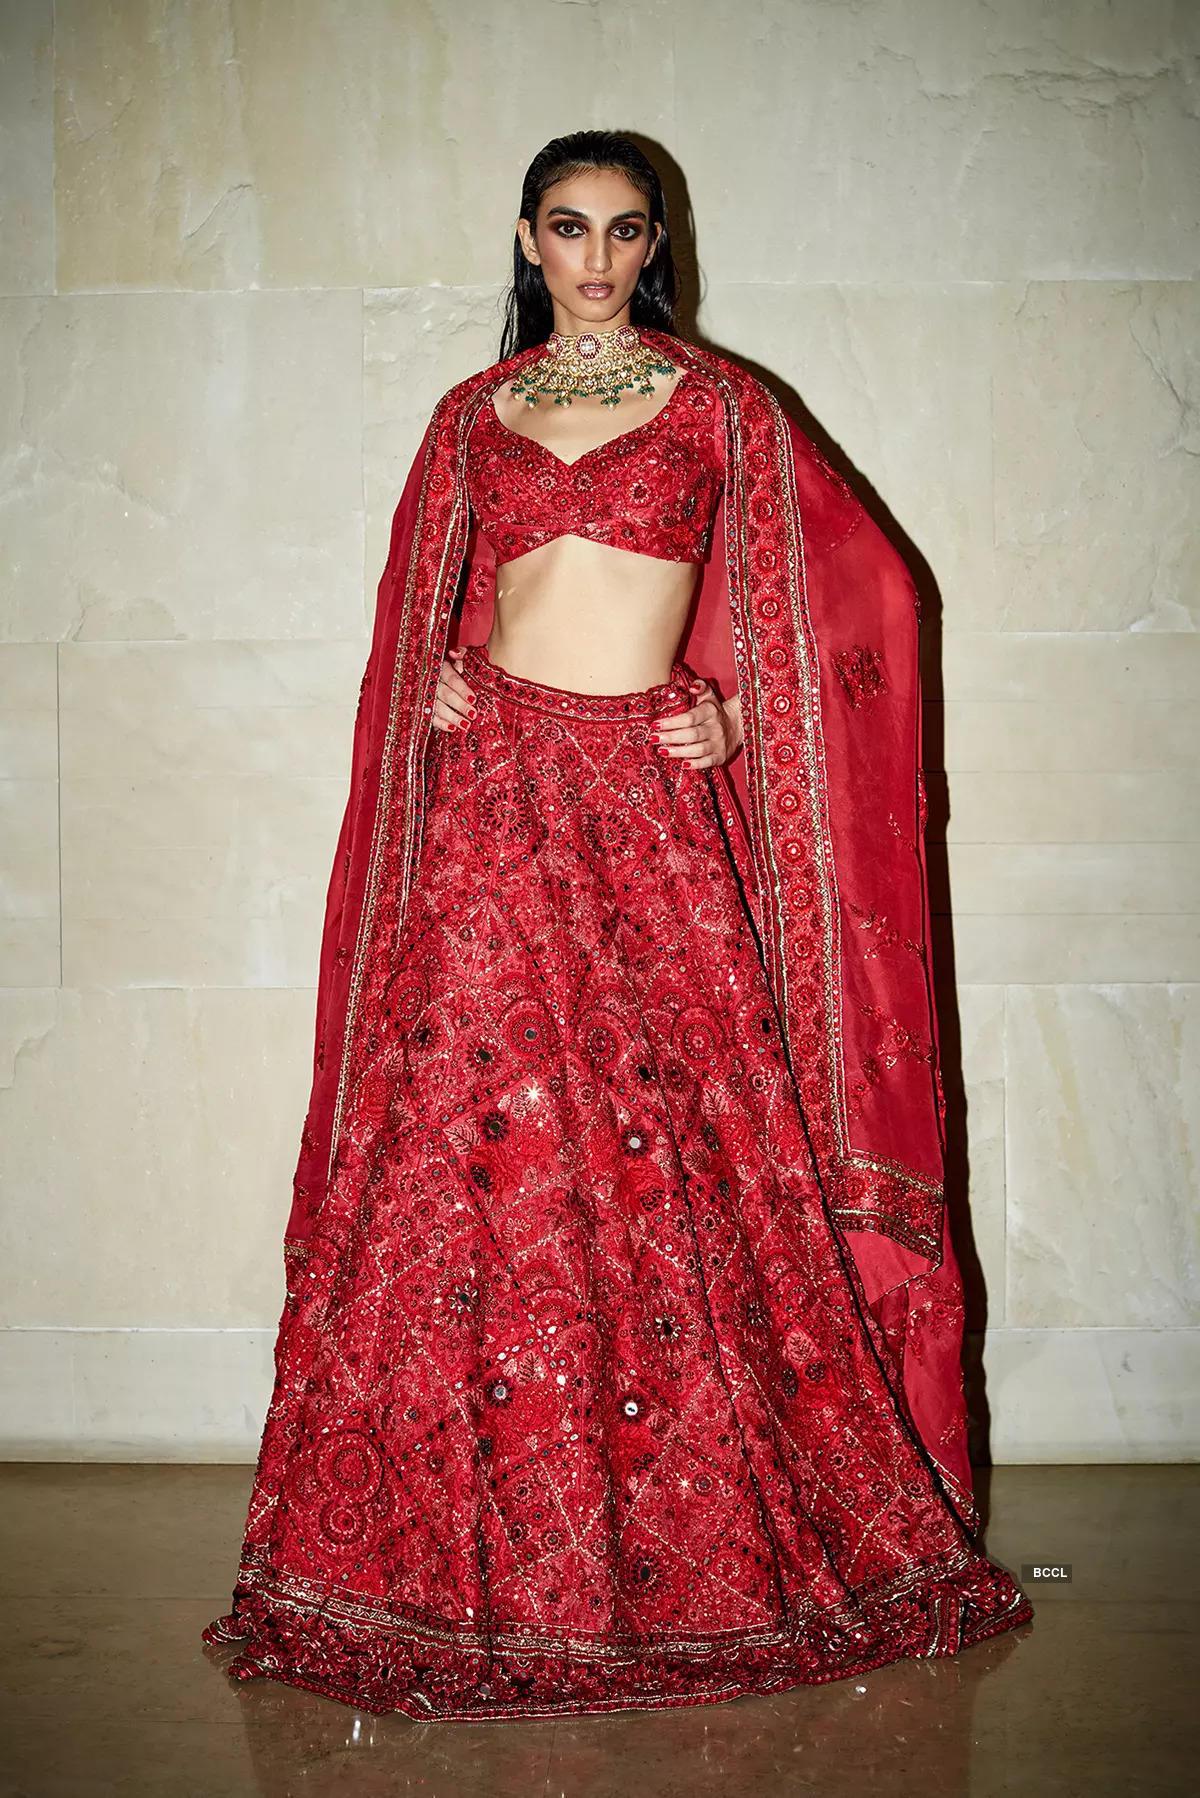 Fashion Show 2021: Varun Bahl